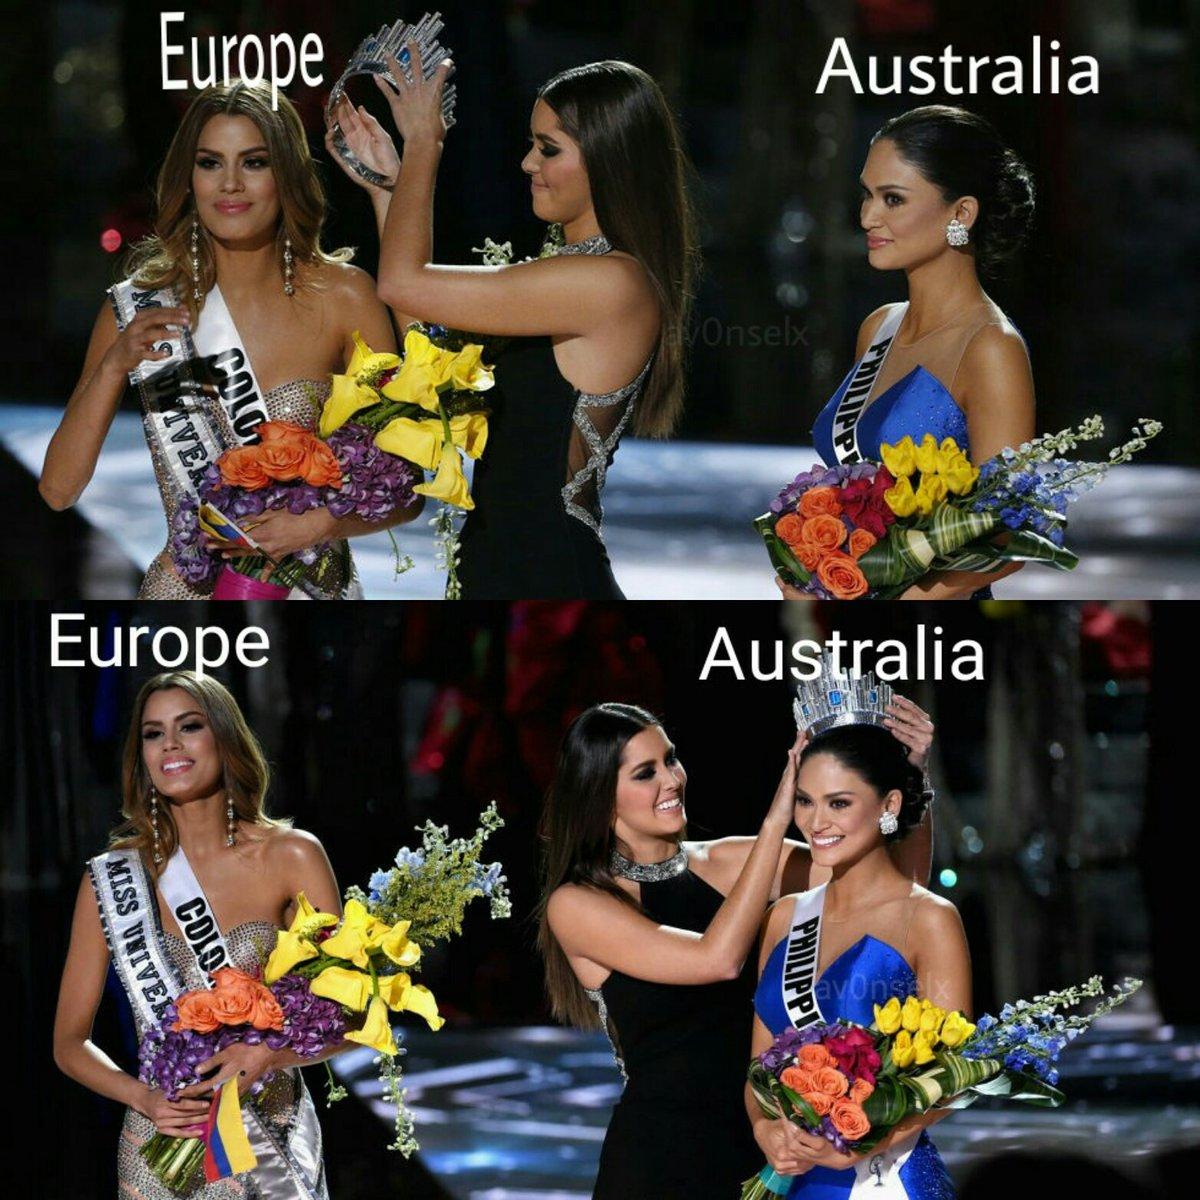 I had to #Eurovision https://t.co/4XgsBLlkkM